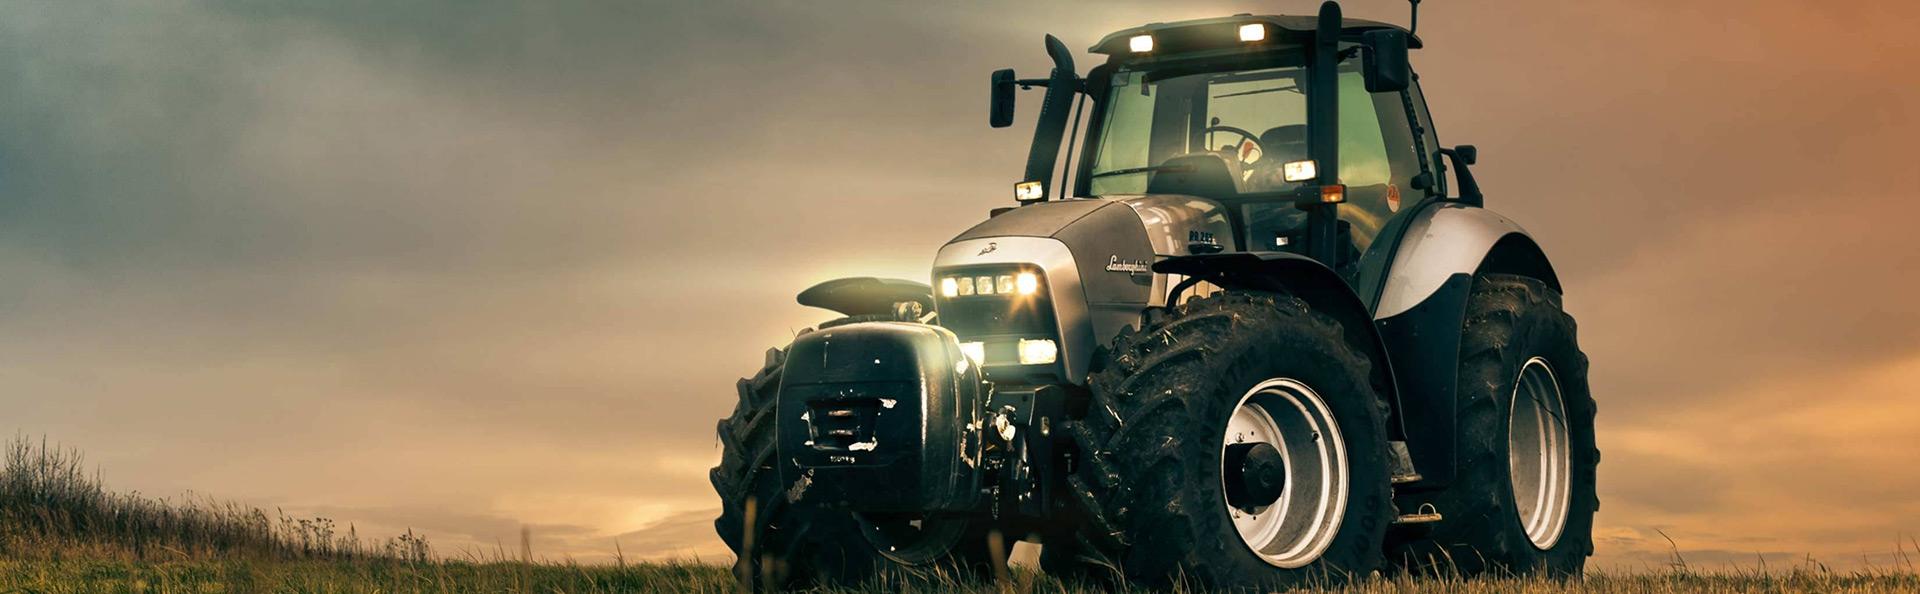 traktorr.jpg